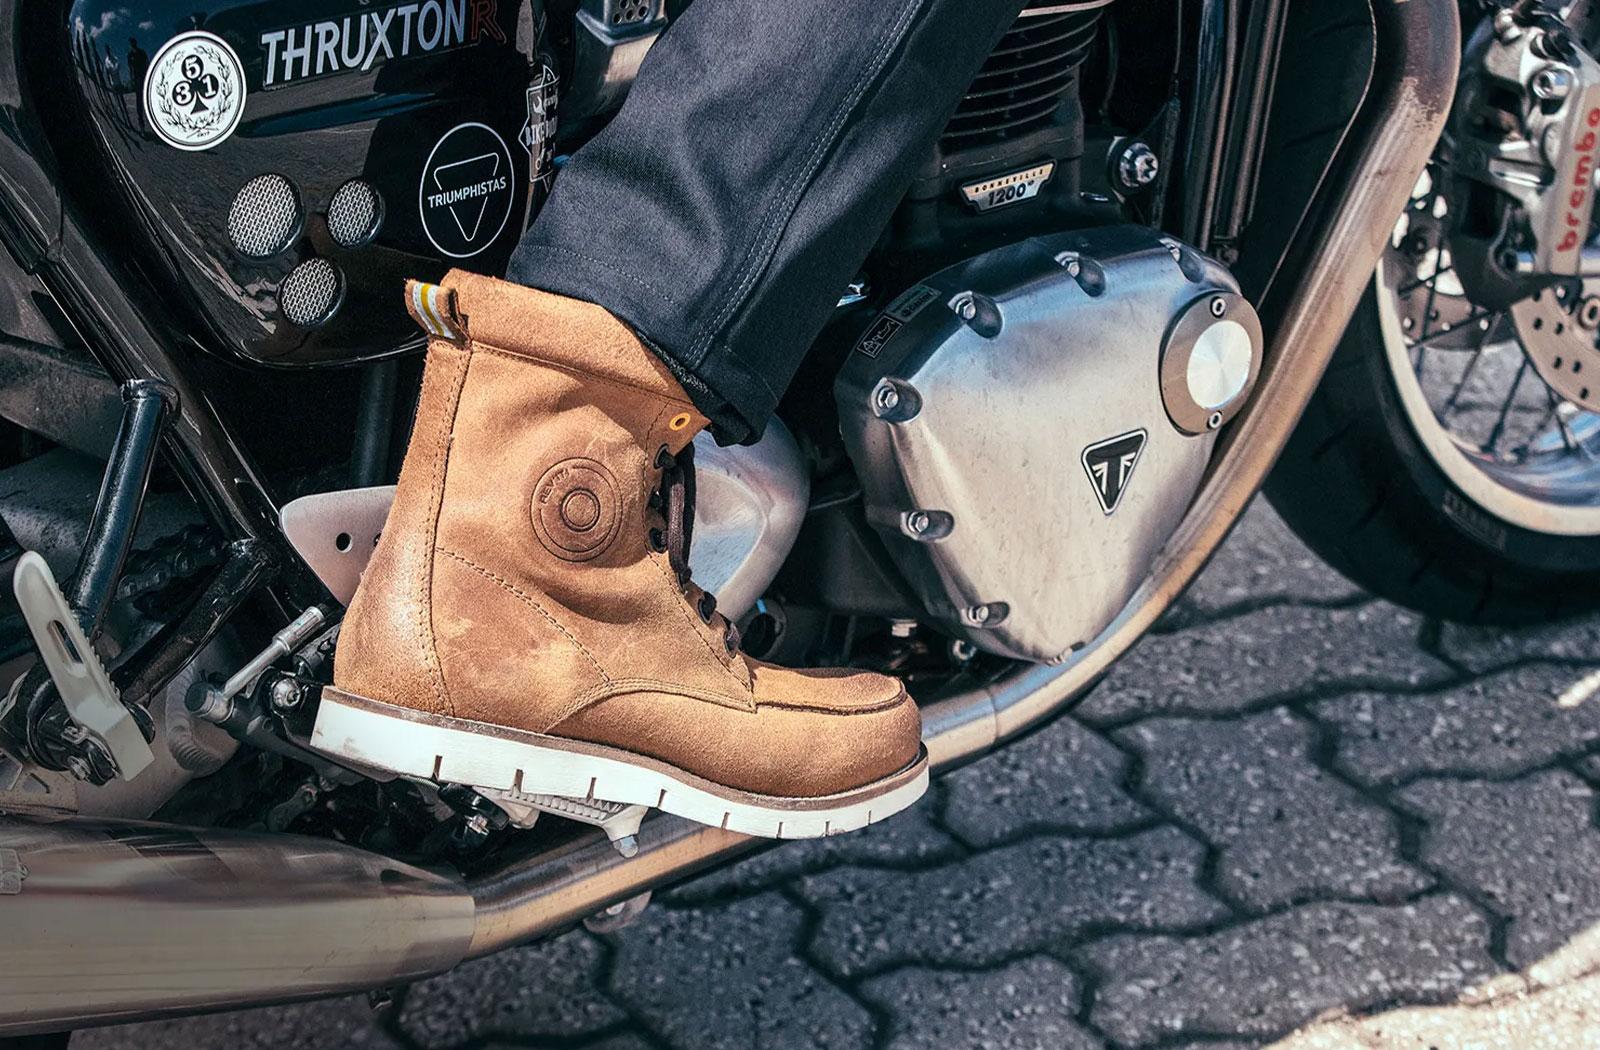 Revi'it! Yukon motorcycle boots